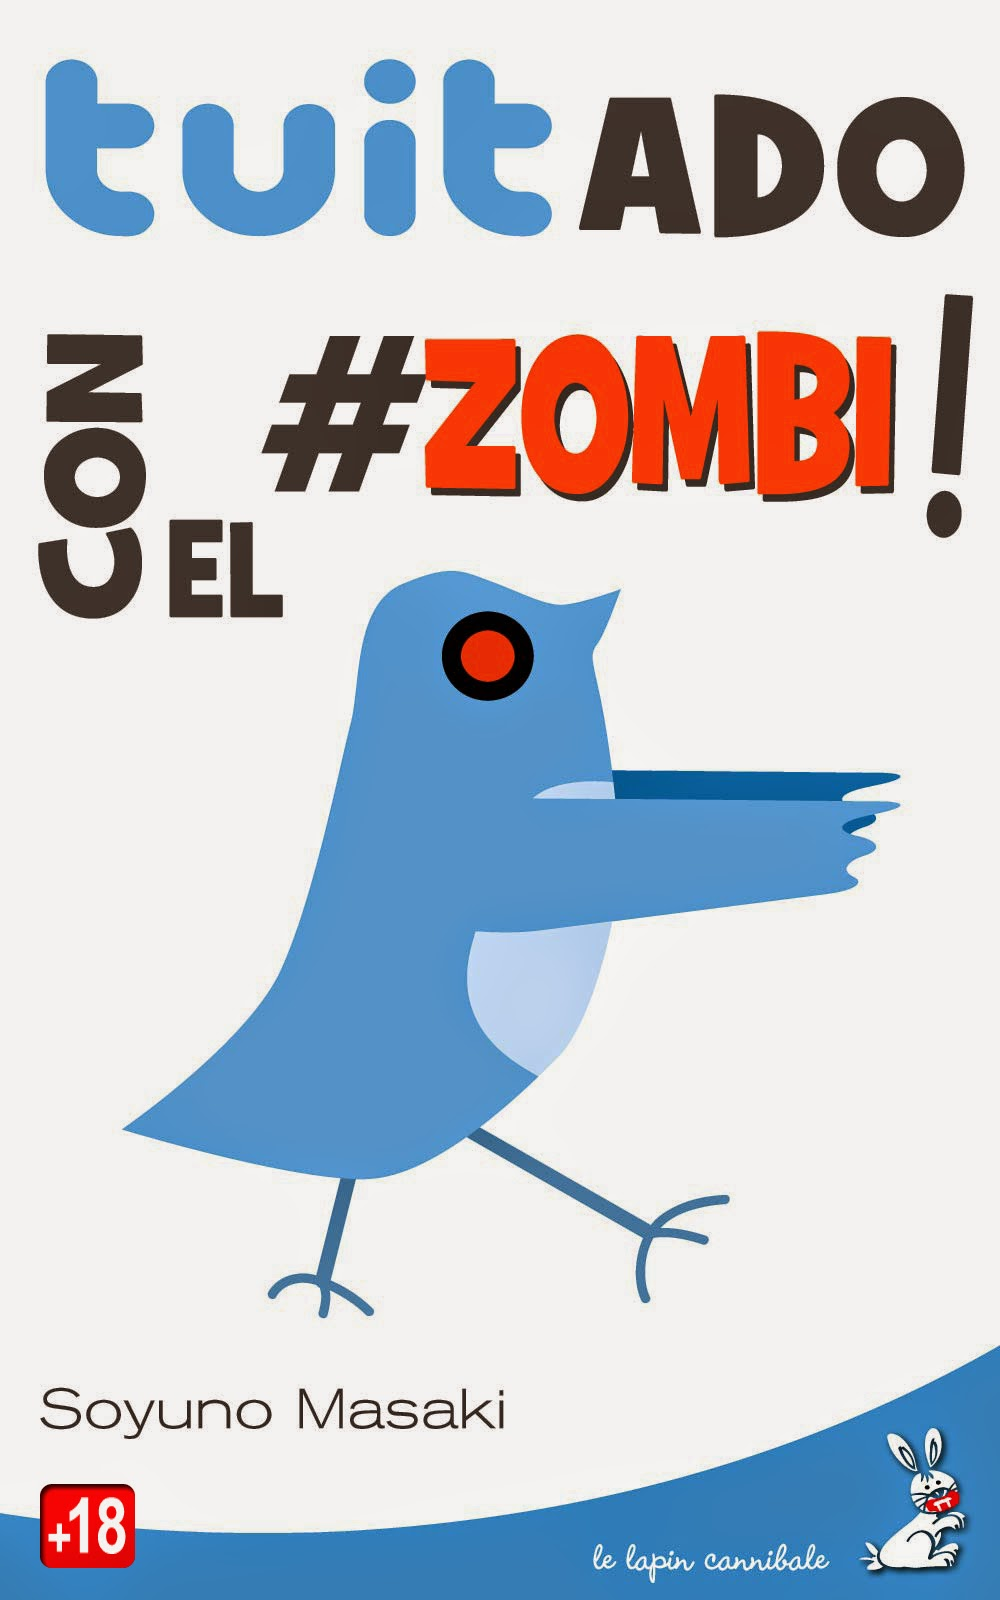 http://www.amazon.es/Tuitado-con-zombi-Soyuno-Masaki-ebook/dp/B00OVKYENE